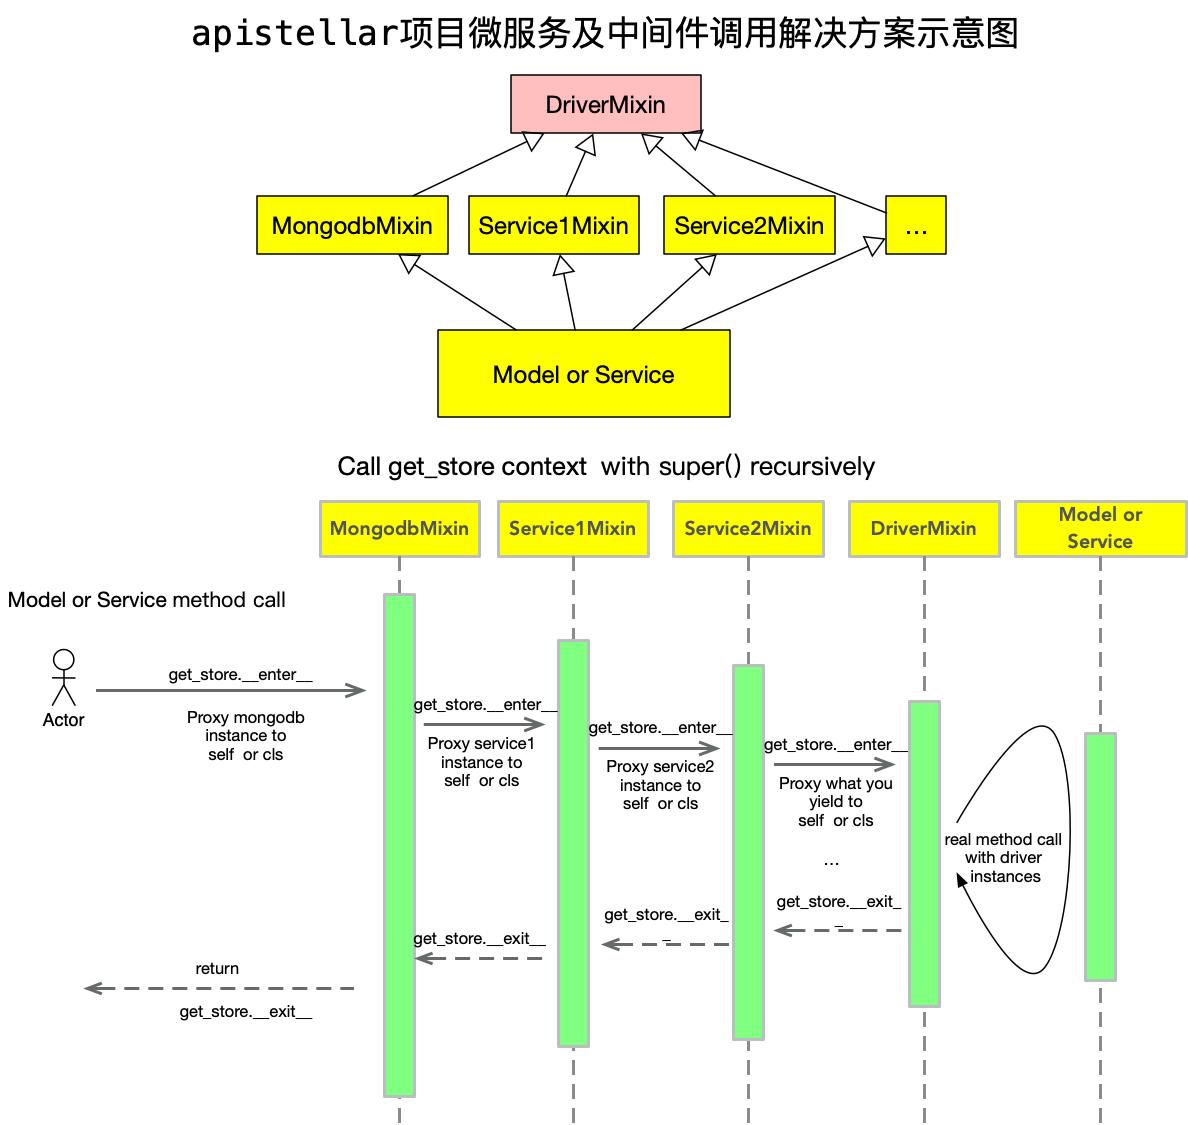 apistellar项目微服务及中间件调用解决方案示意图